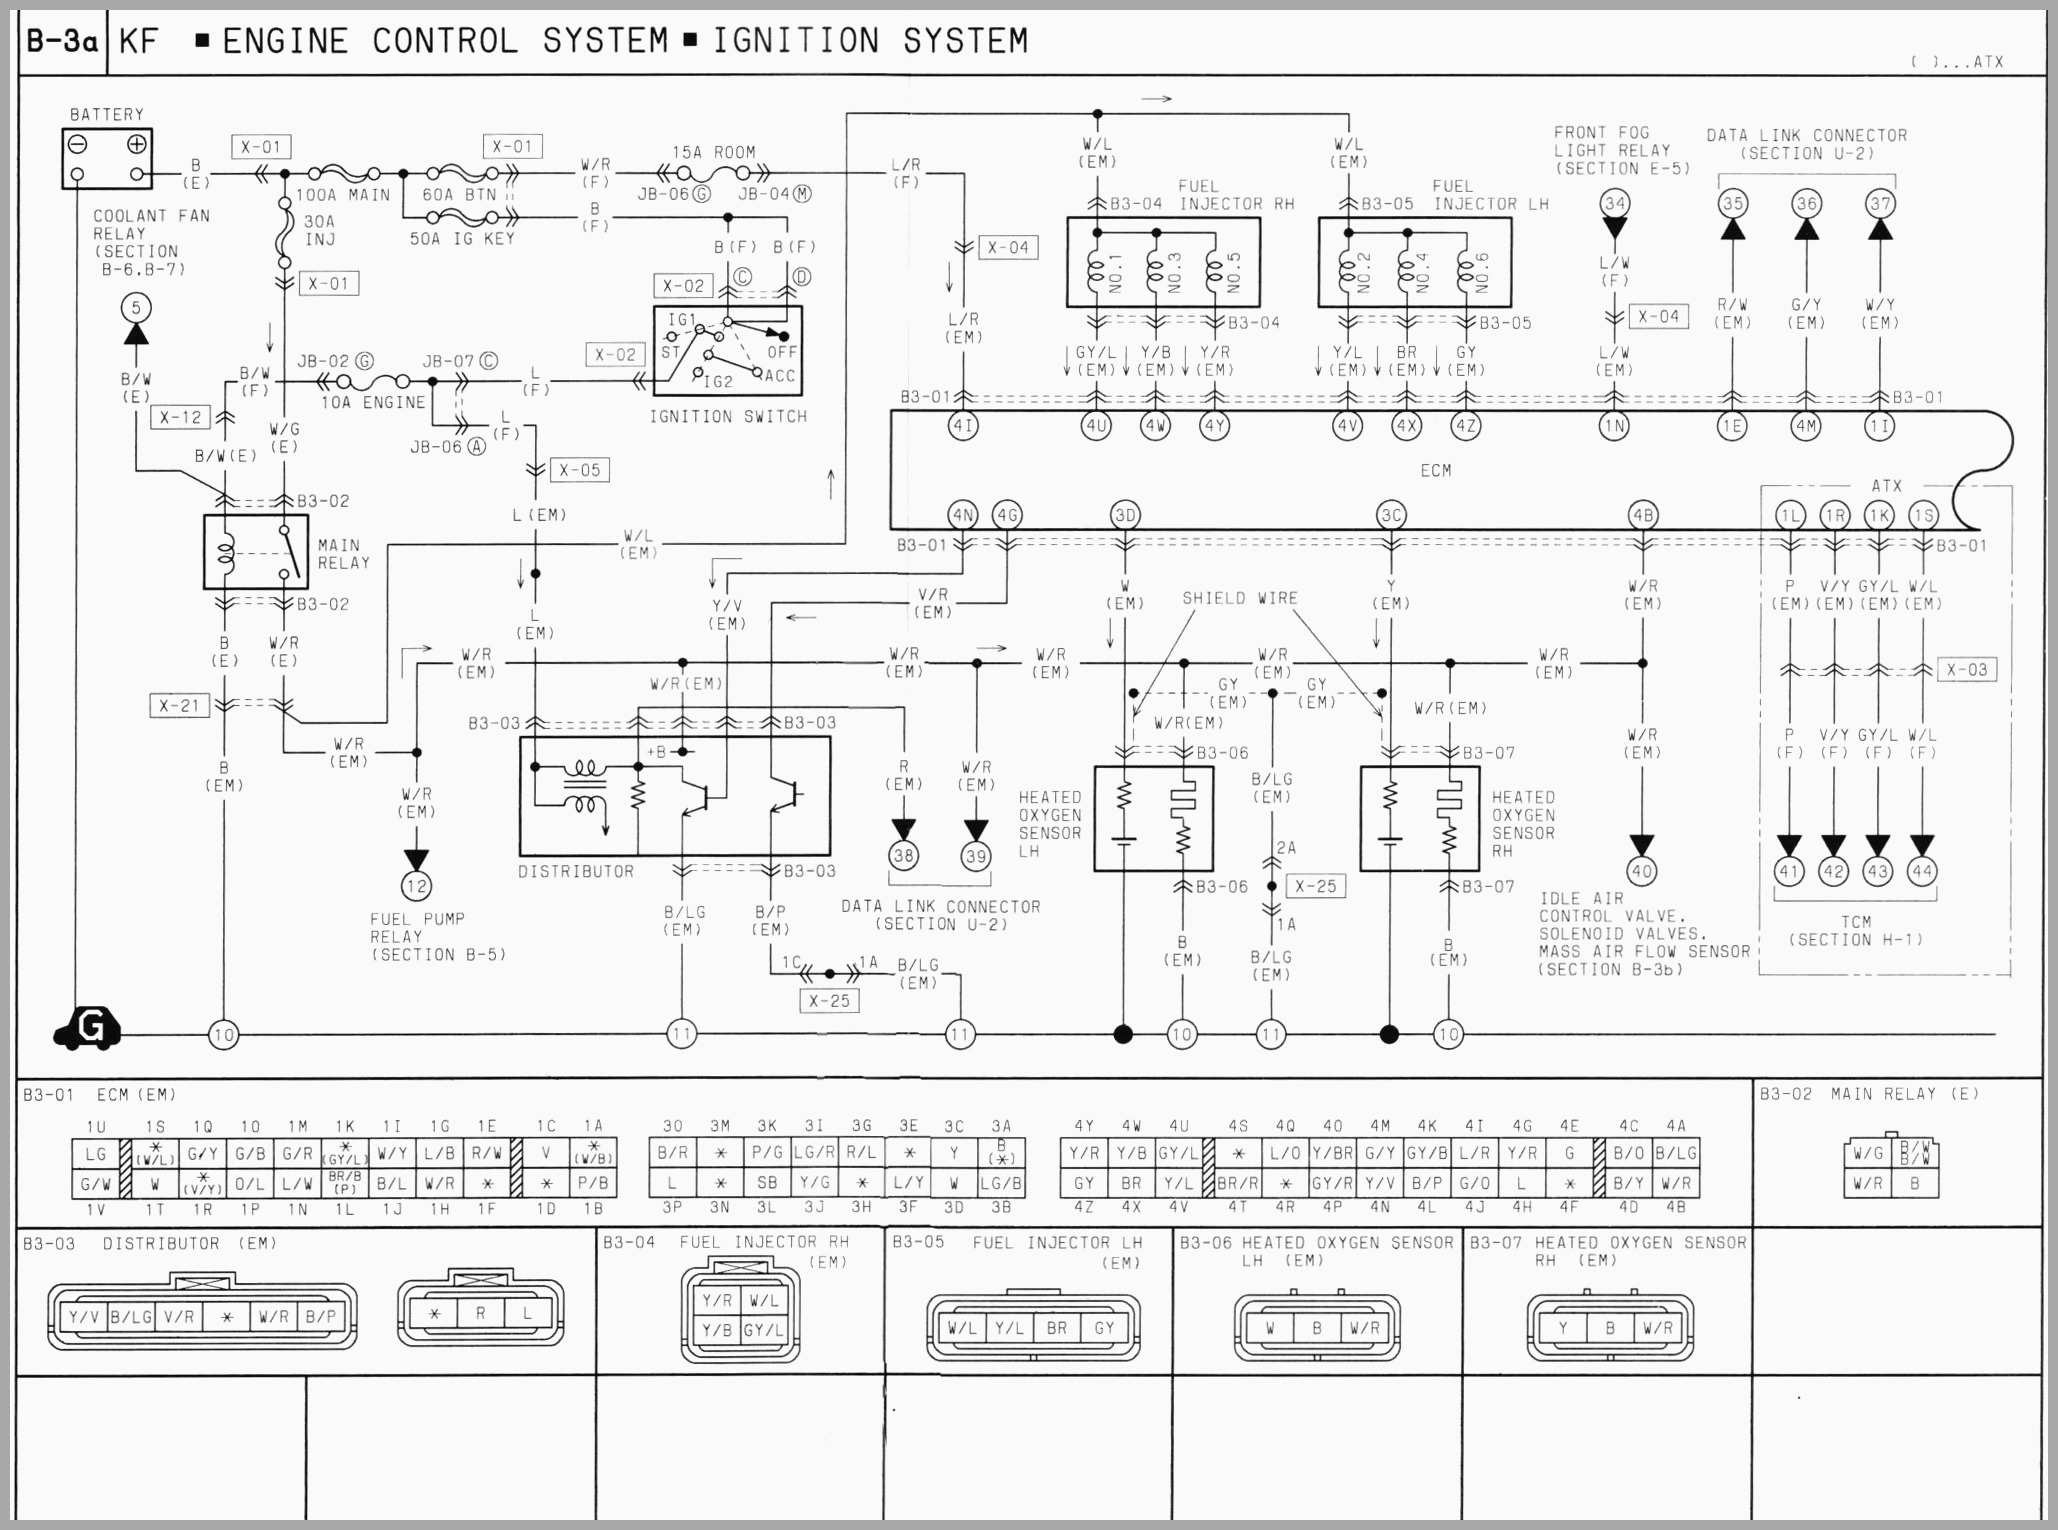 1995 Mazda 626 Engine Diagram My Wiring DIagram